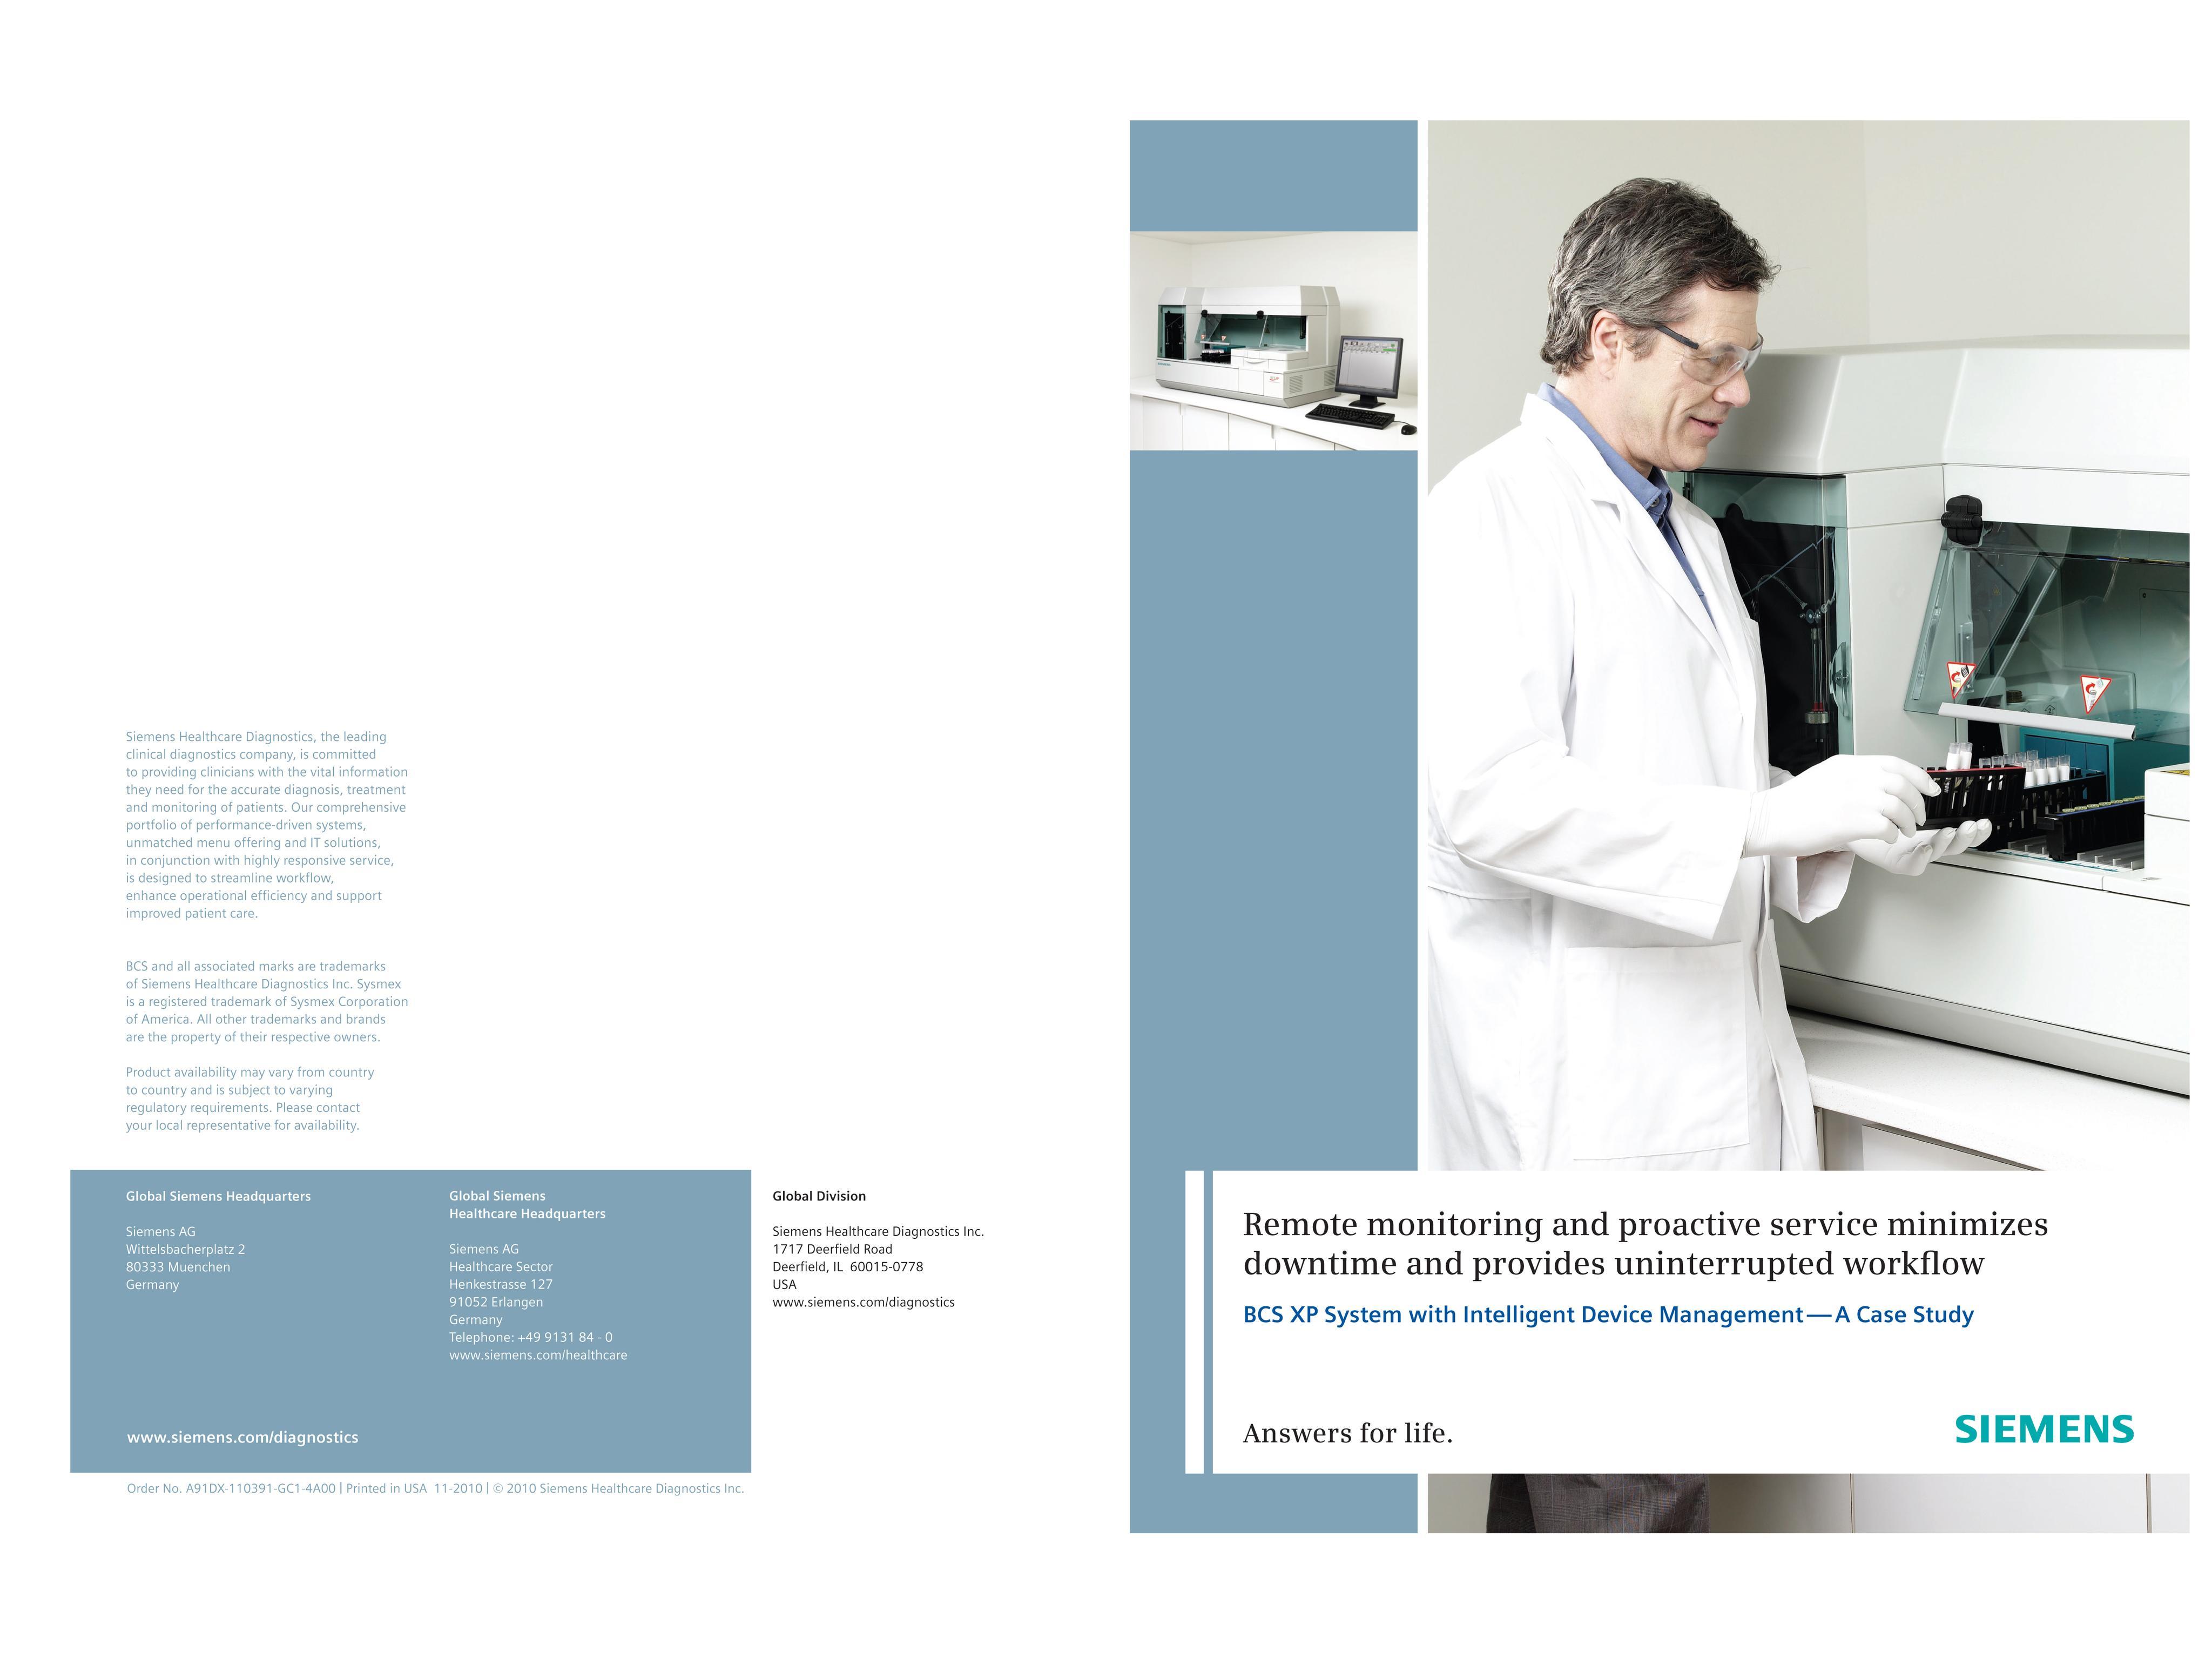 BCS XP System with Intelligent Device Management